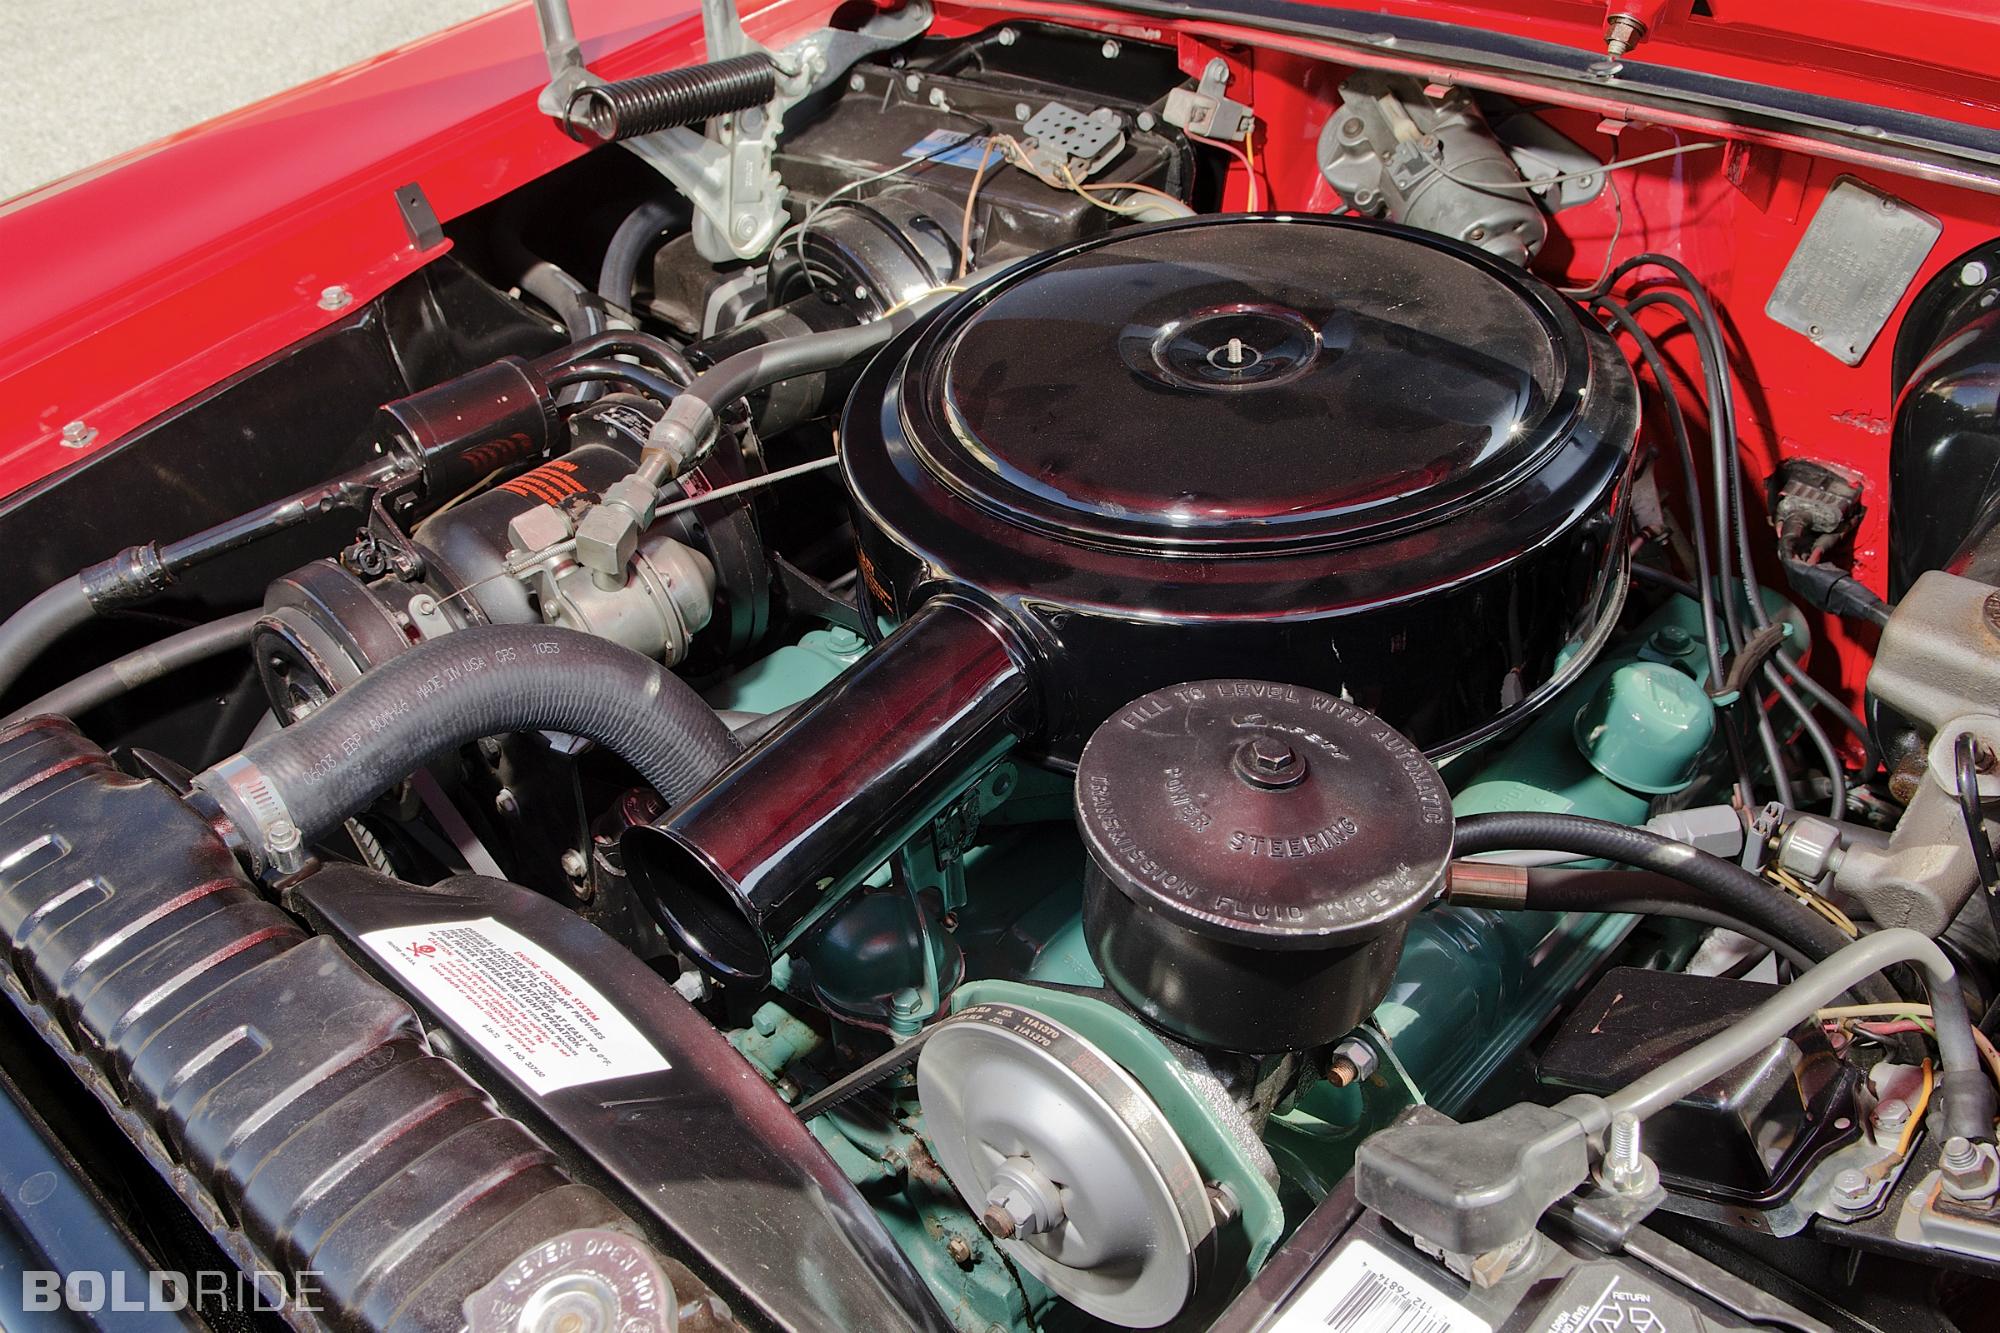 1957 buick caballero wagon stationwagon retro engine engines wallpaper 2000x1333 104063